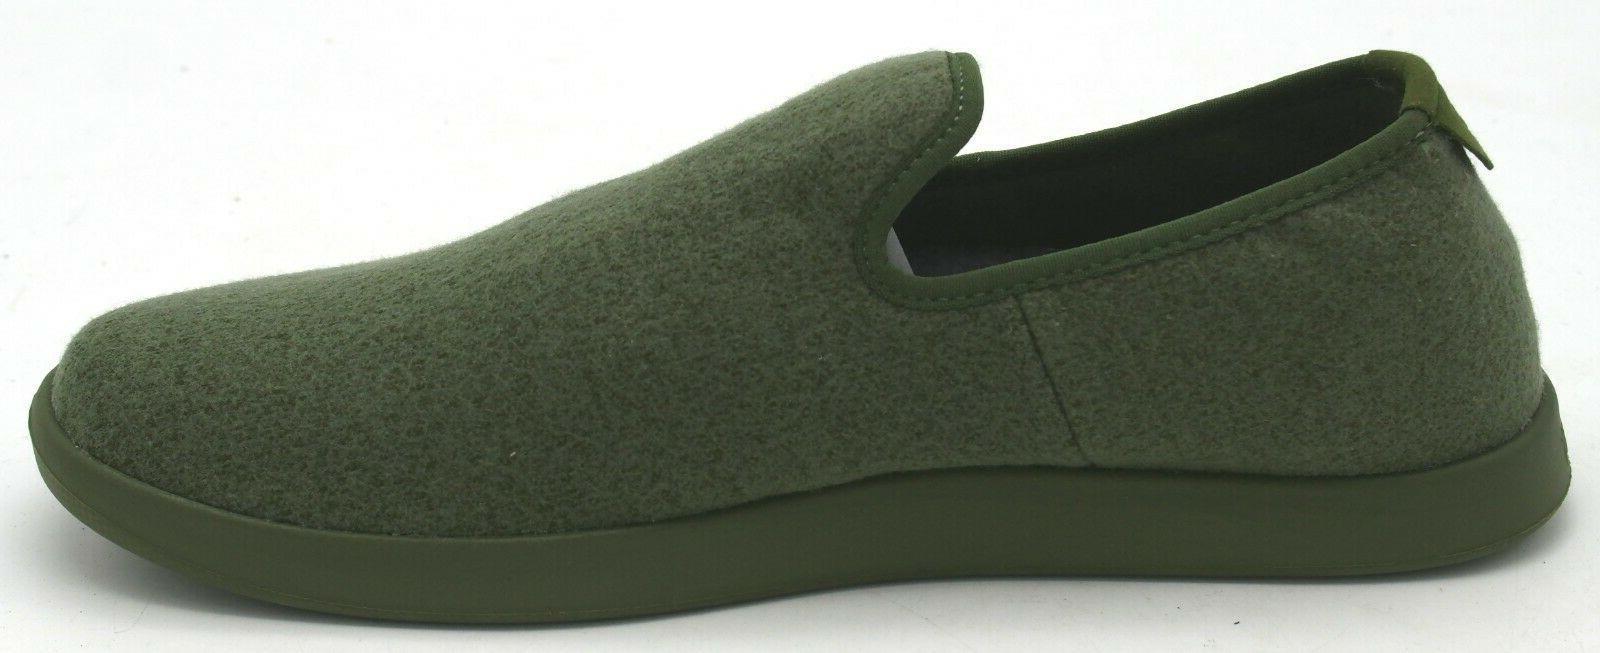 New Box Allbirds Wool Loafer Black Gray